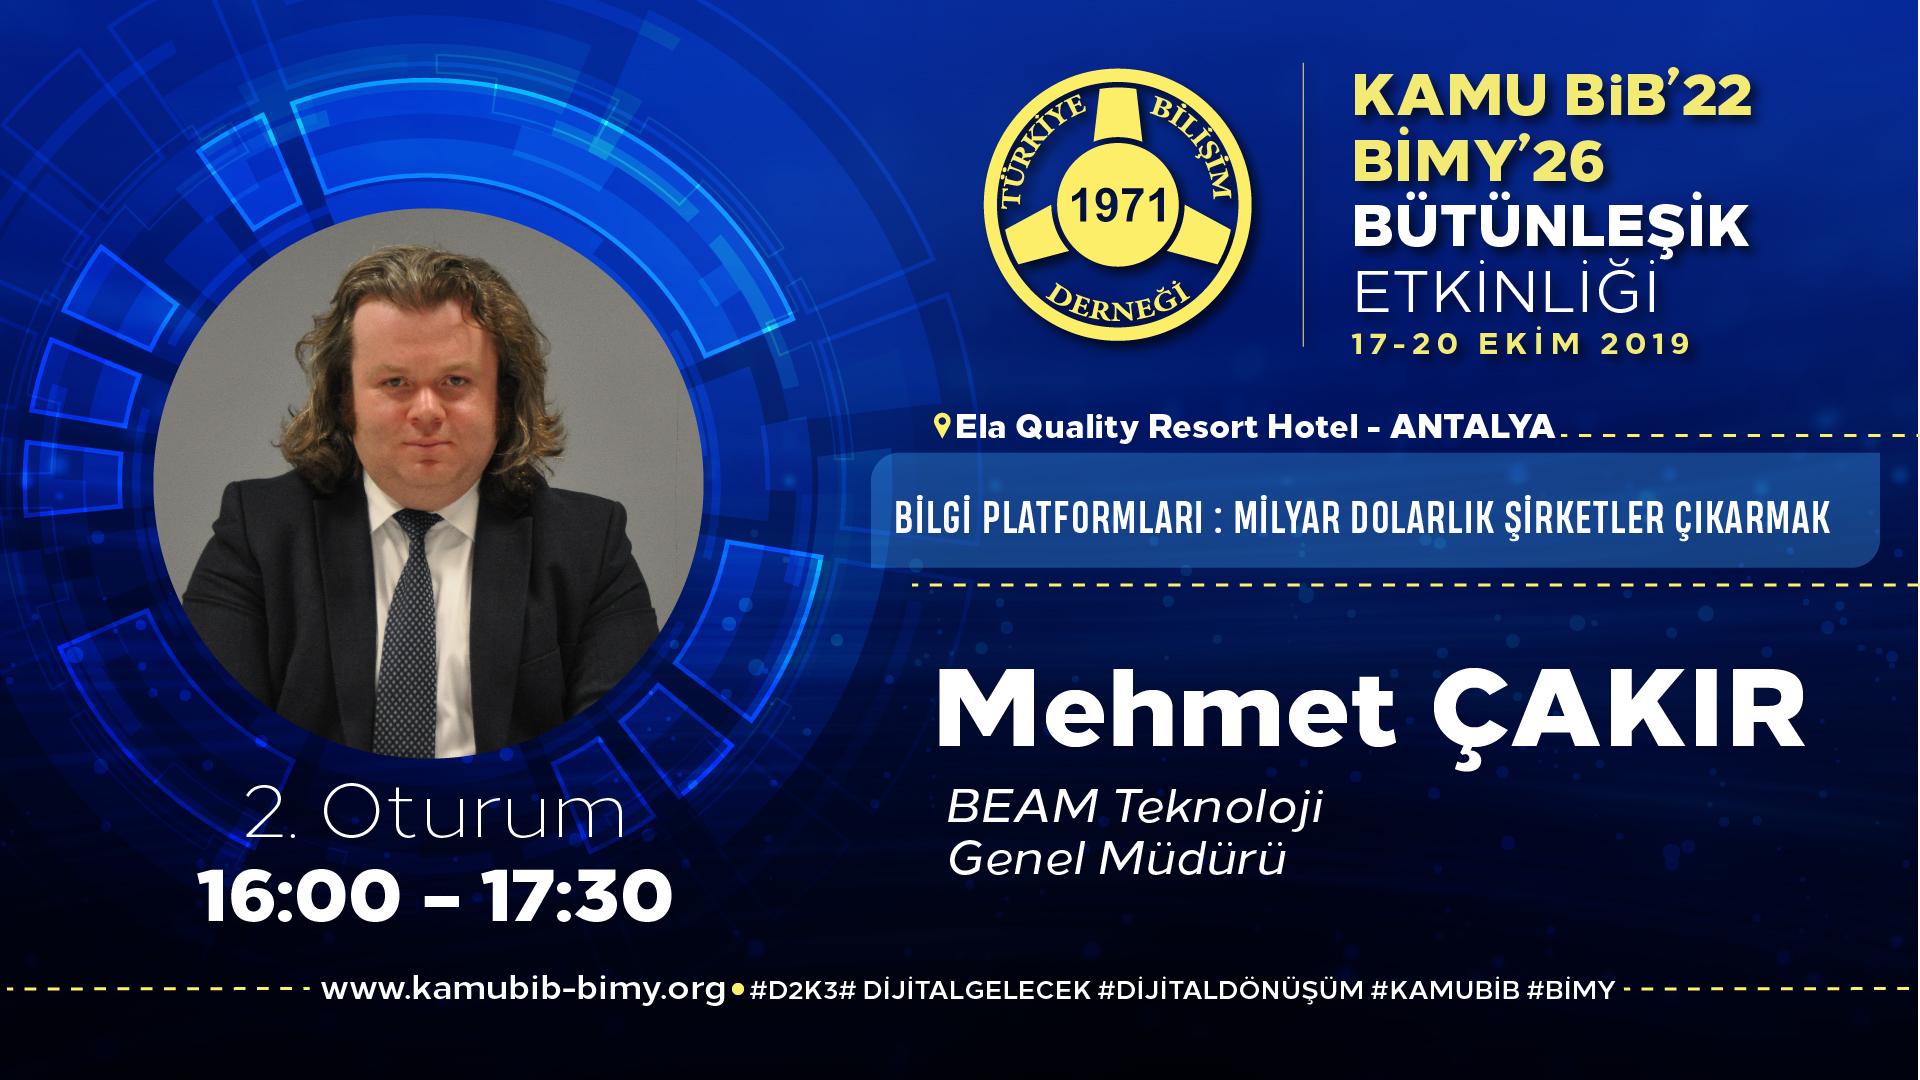 Mehmet ÇAKIR - KamuBİB'22 BİMY'26